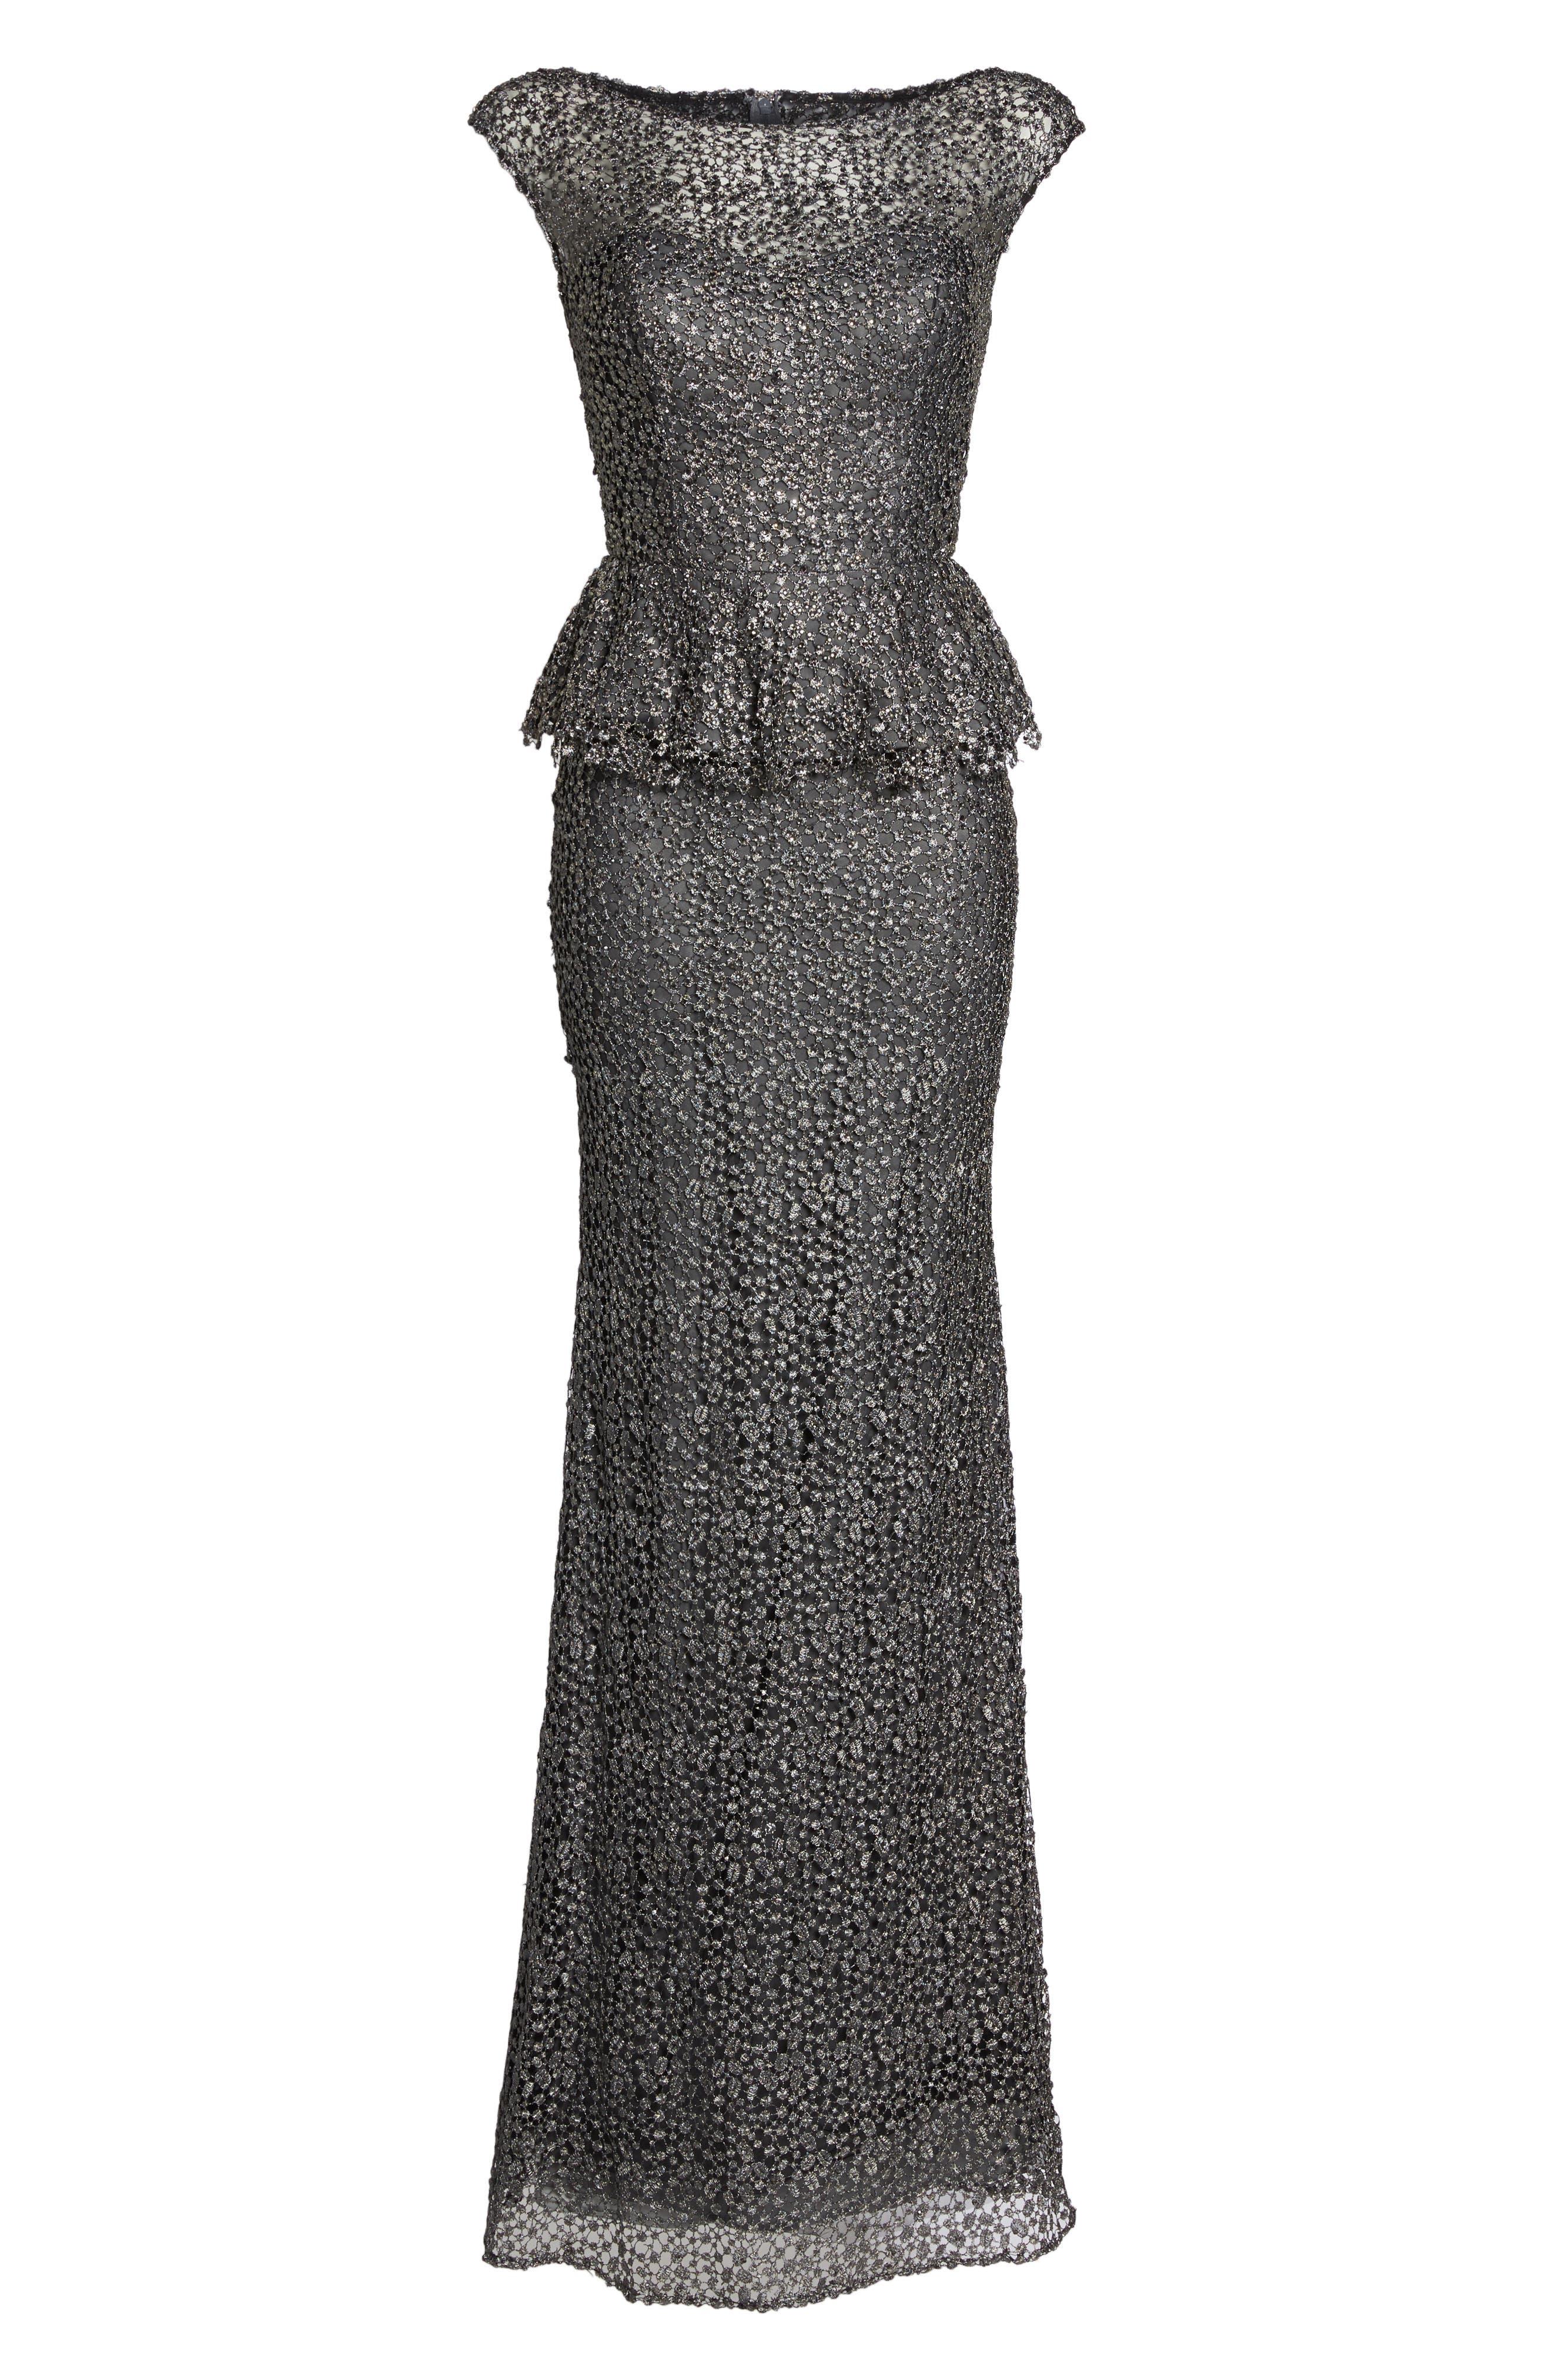 LA FEMME, Embellished Lace Peplum Gown, Alternate thumbnail 6, color, GUNMETAL